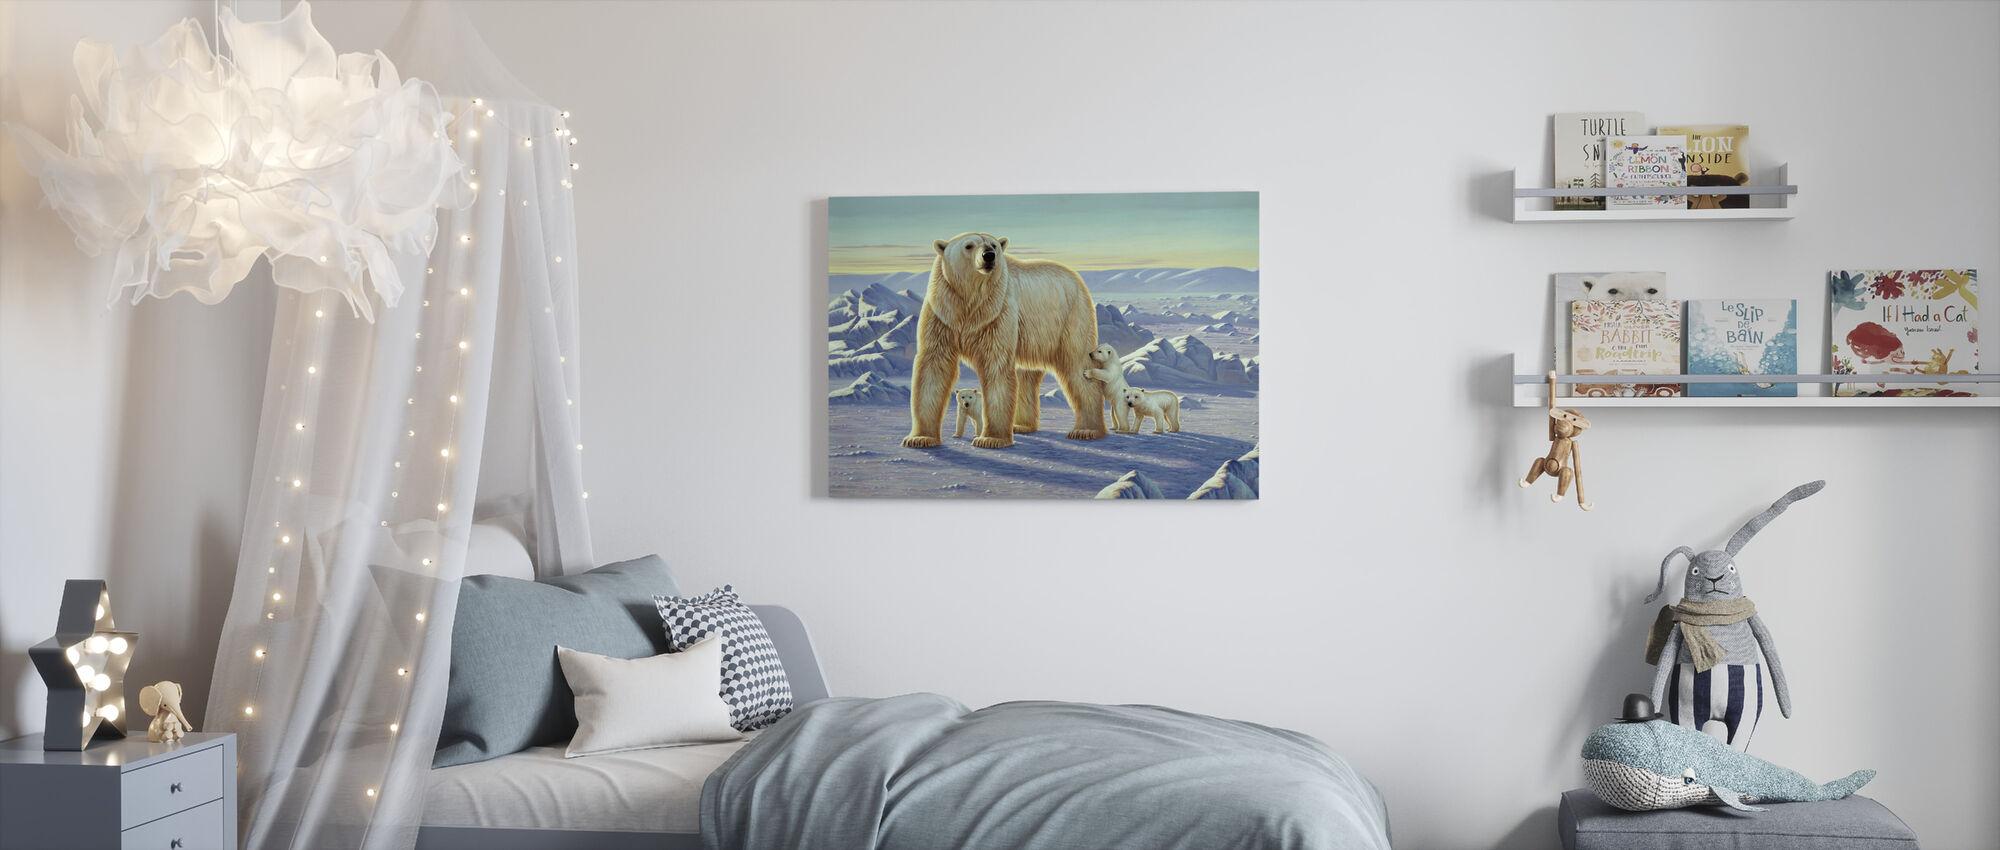 Isbjørn med unger - Lerretsbilde - Barnerom